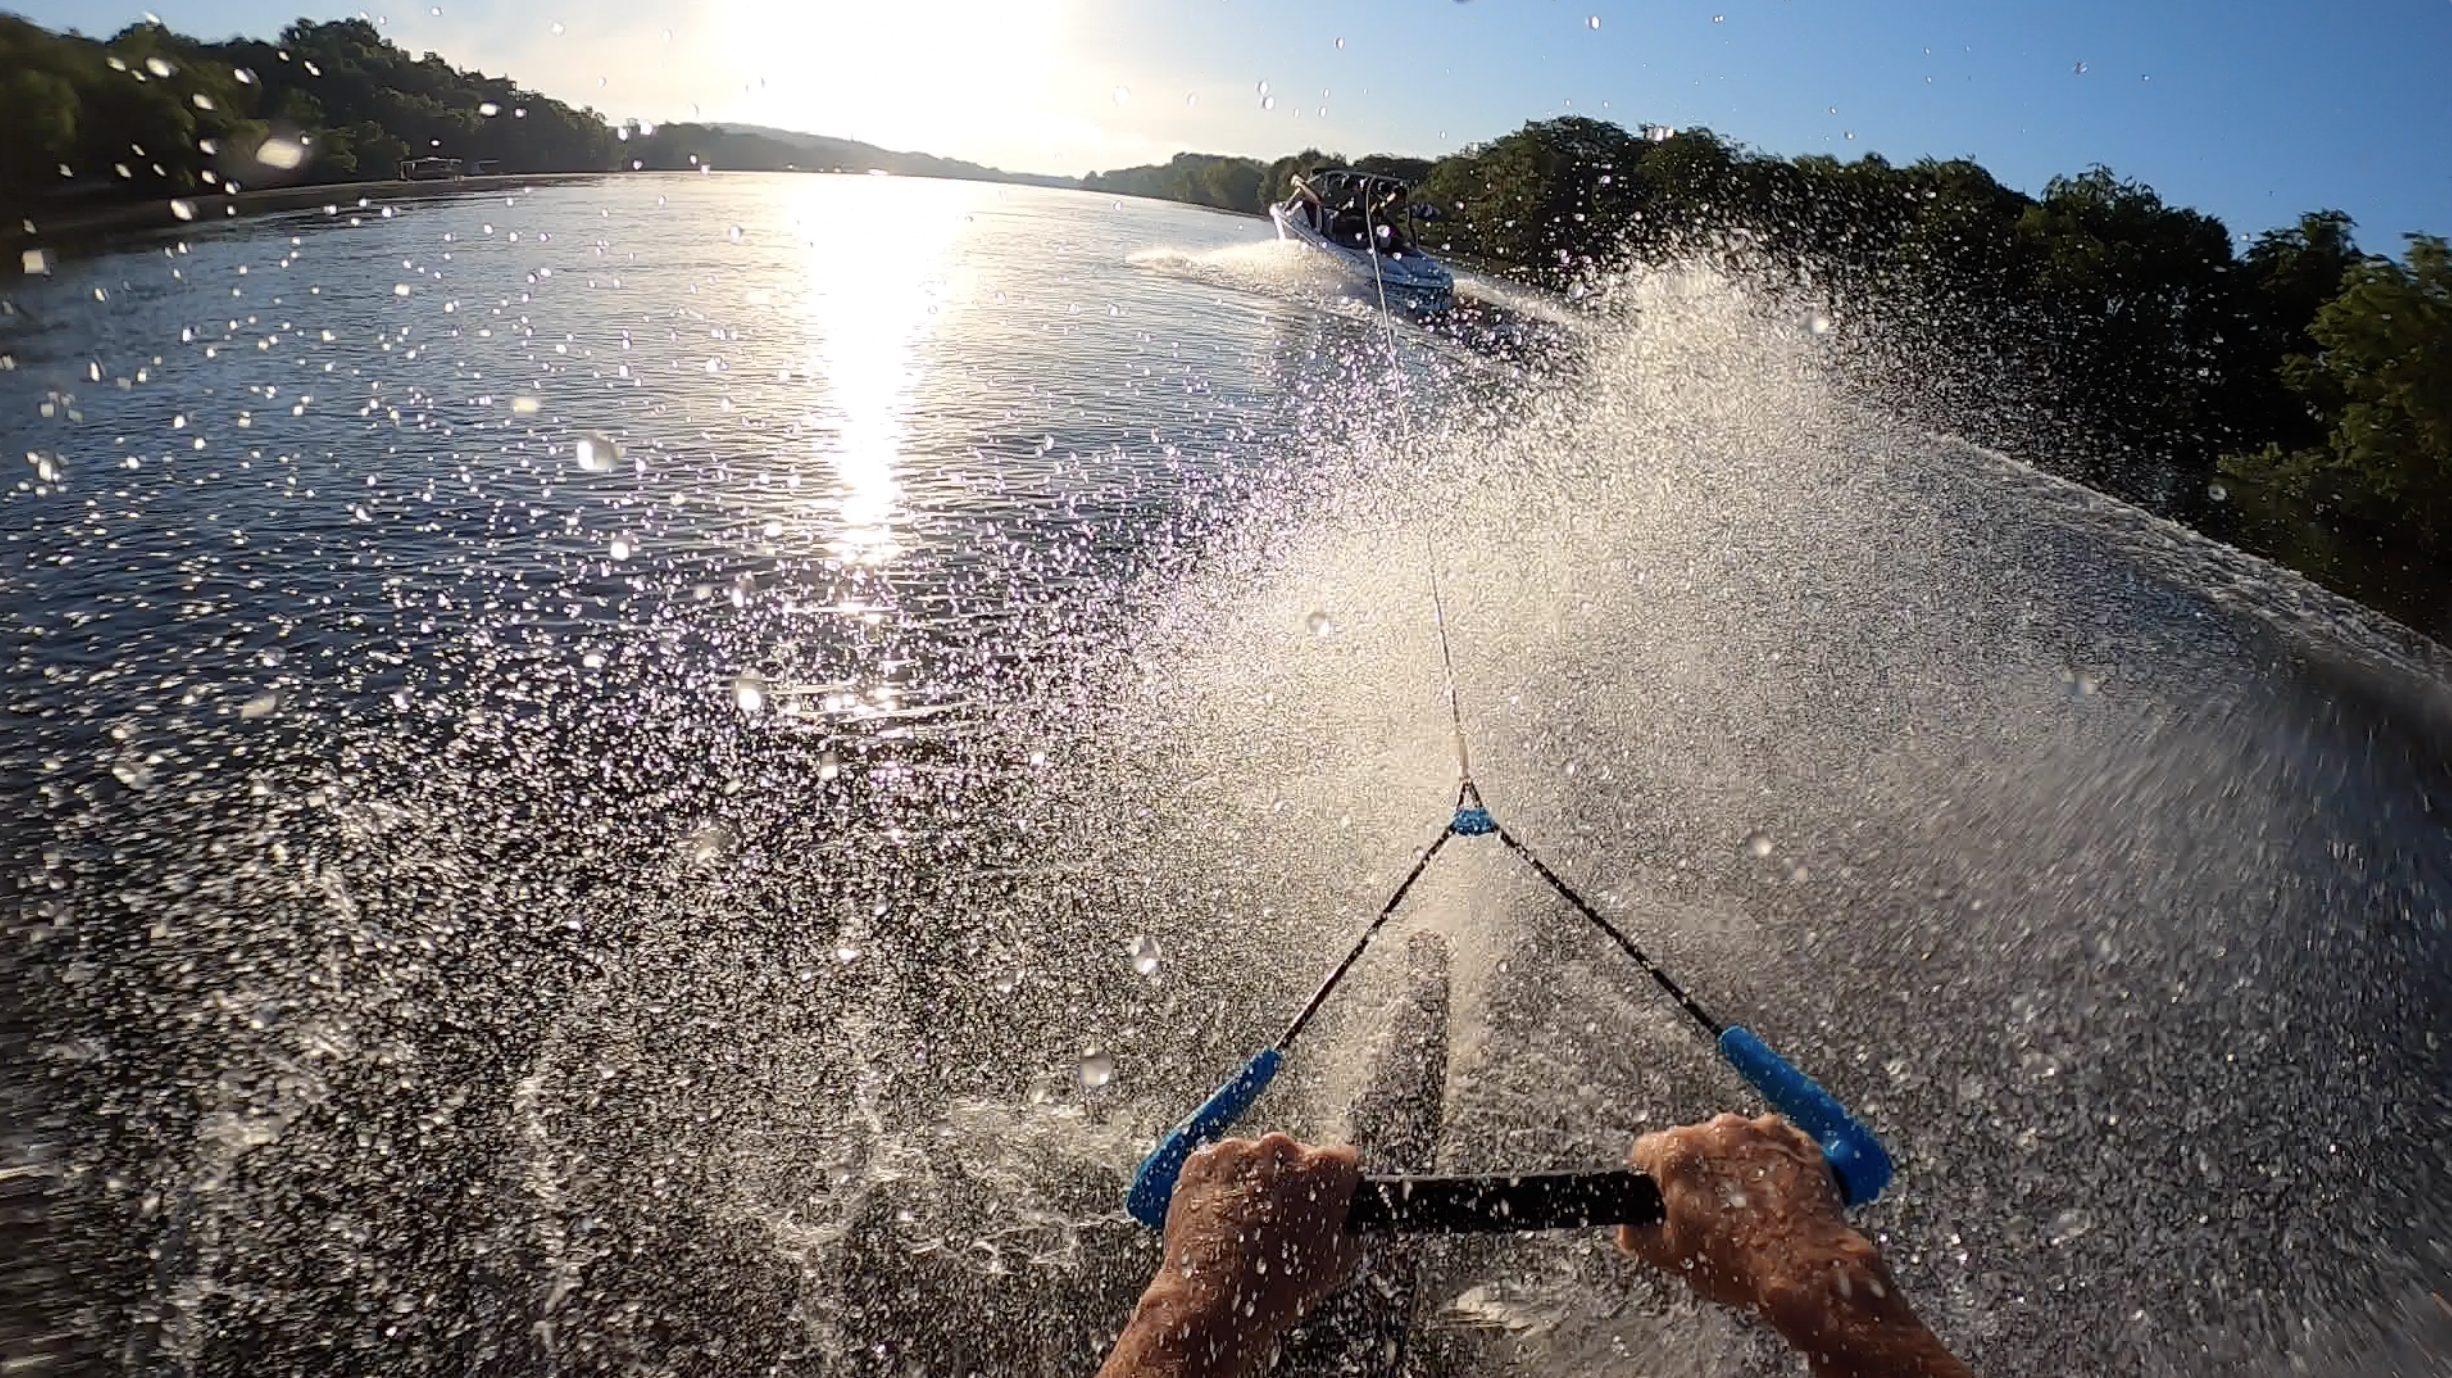 Benton County Water Sports